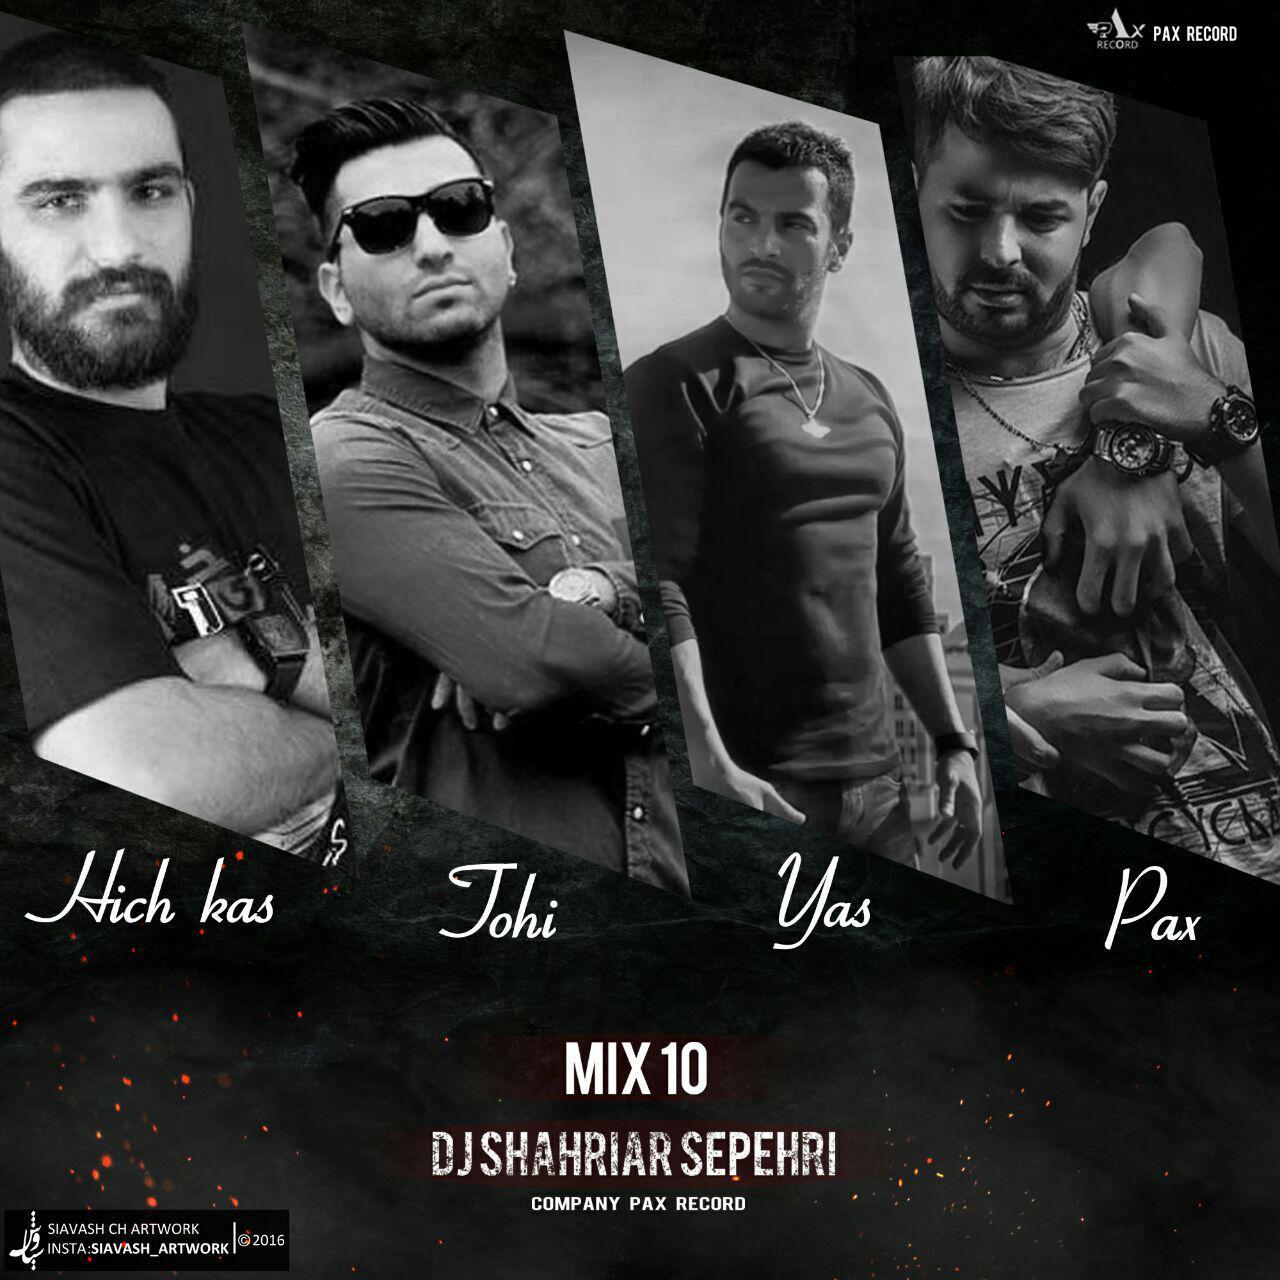 Dj Shahriyar Sepehri - Mix